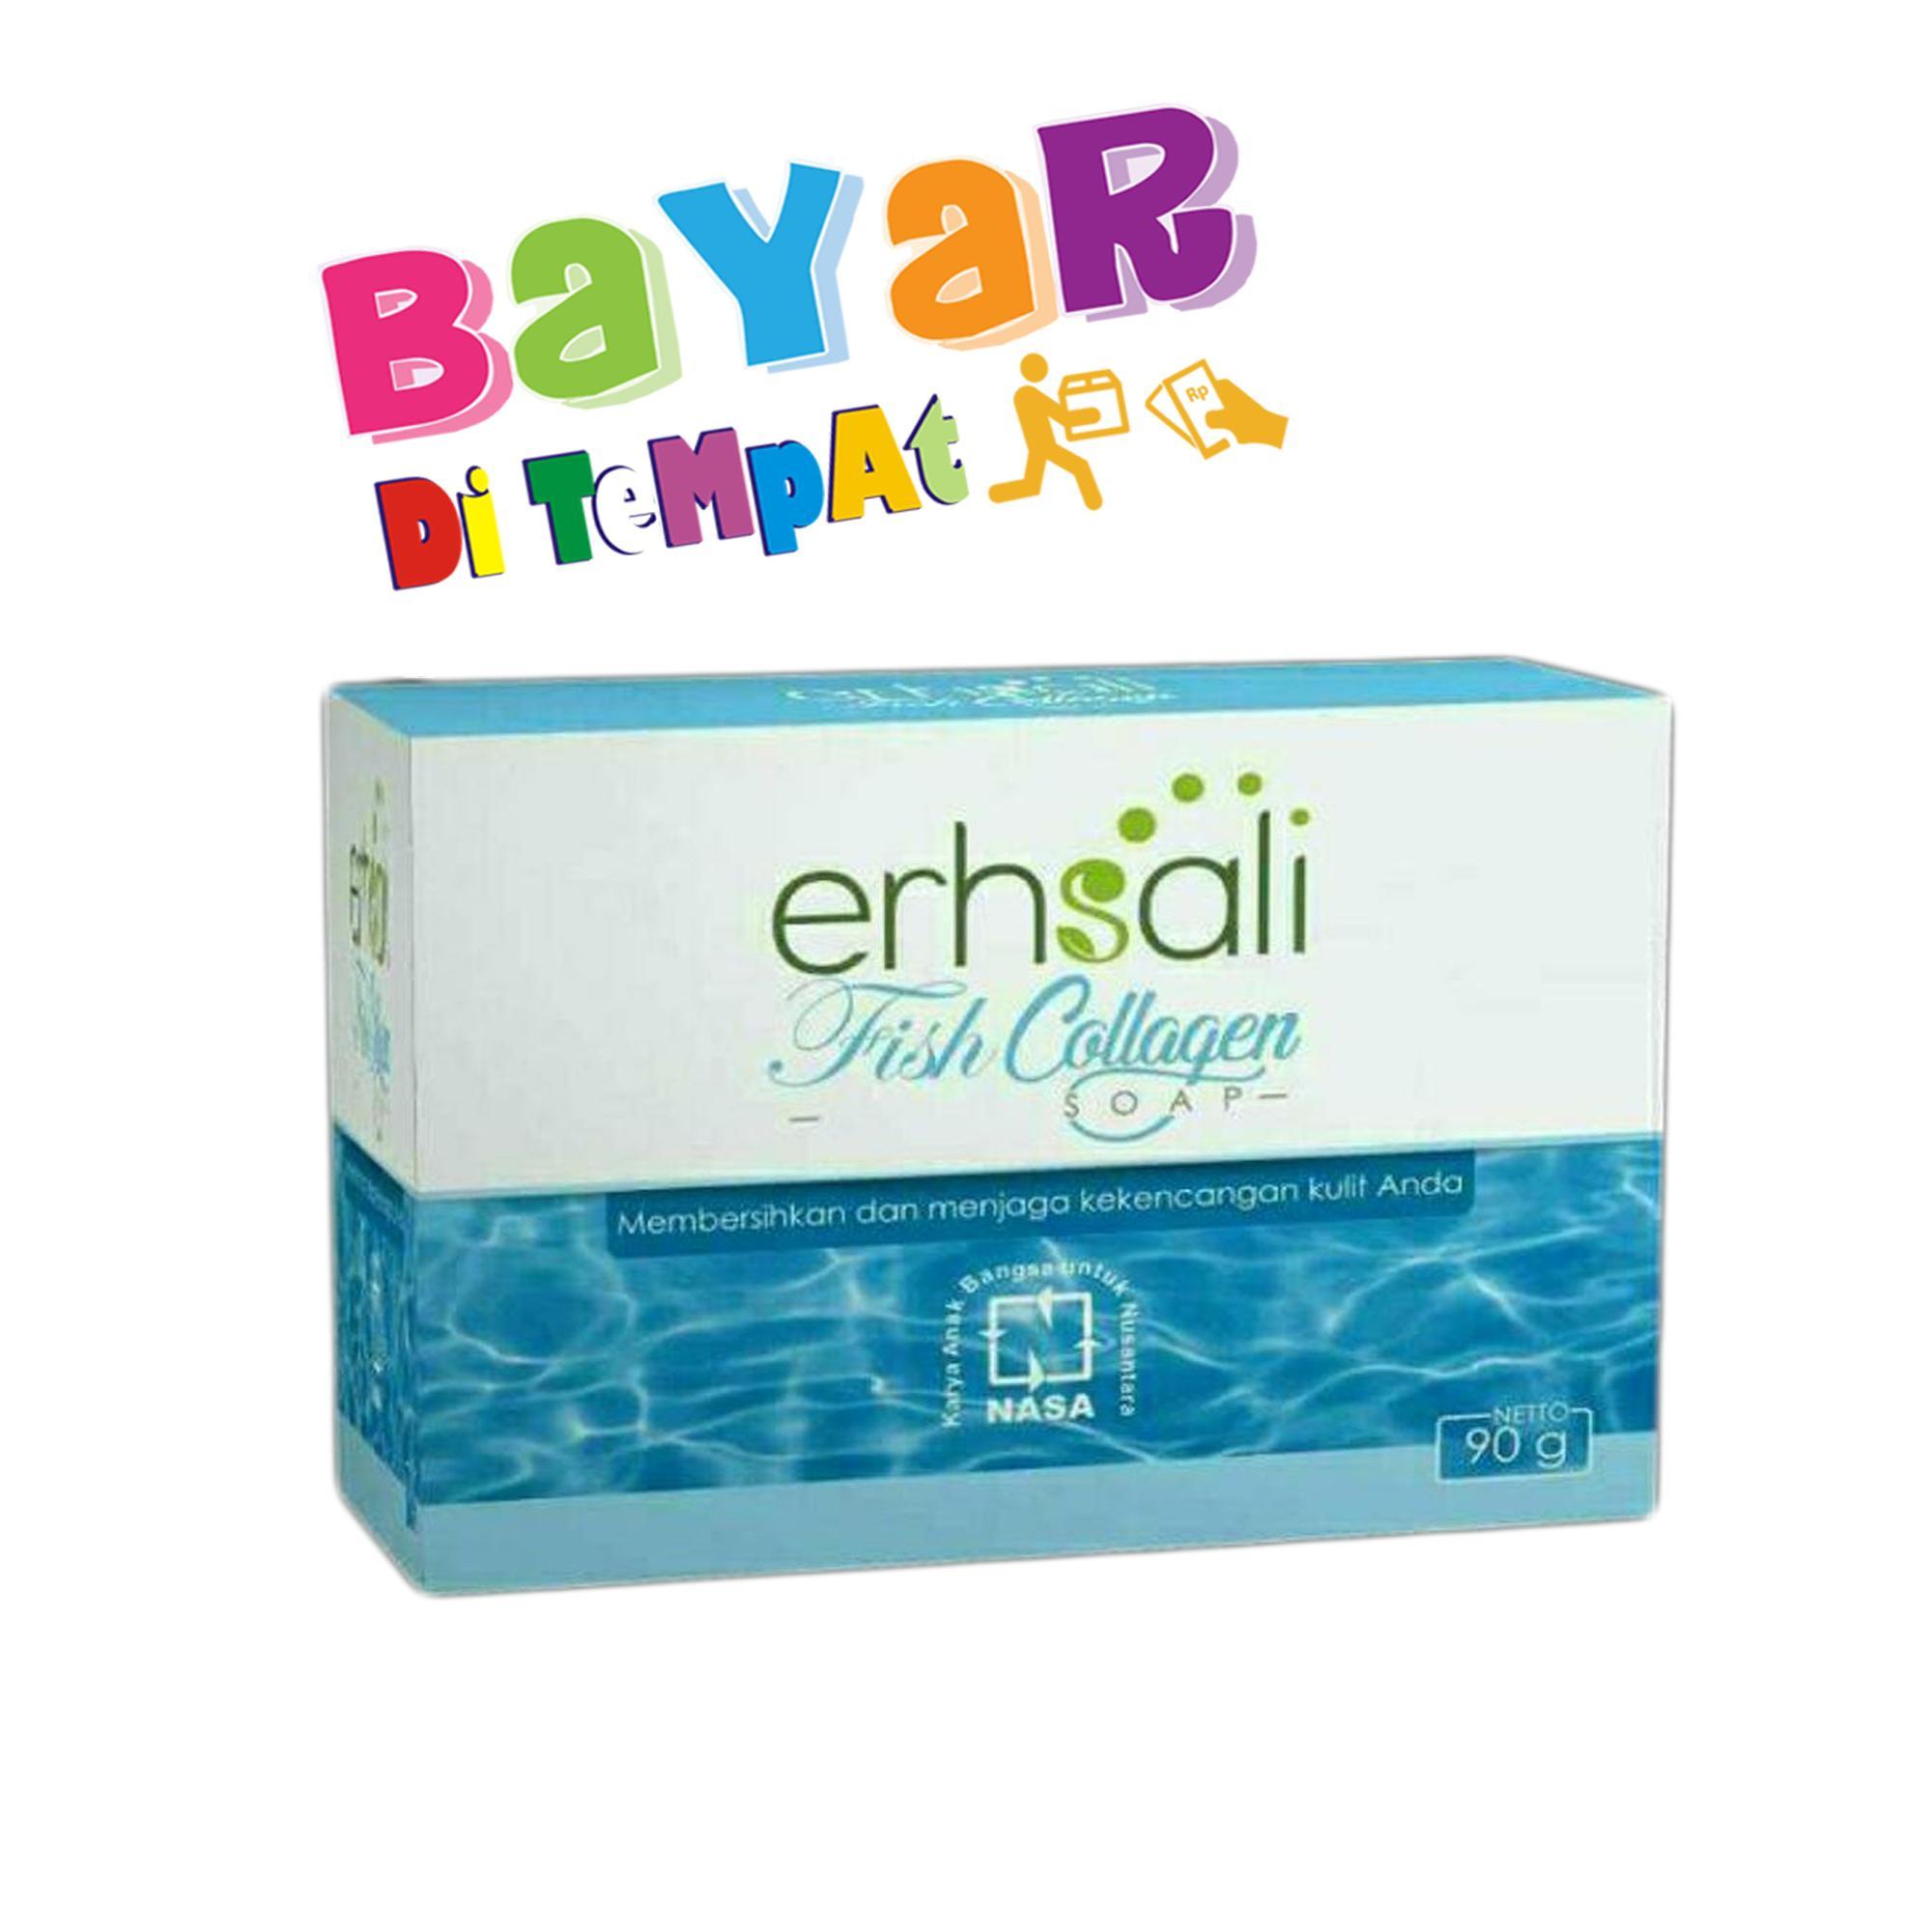 Ershali Fish Collagen Soap Nasa